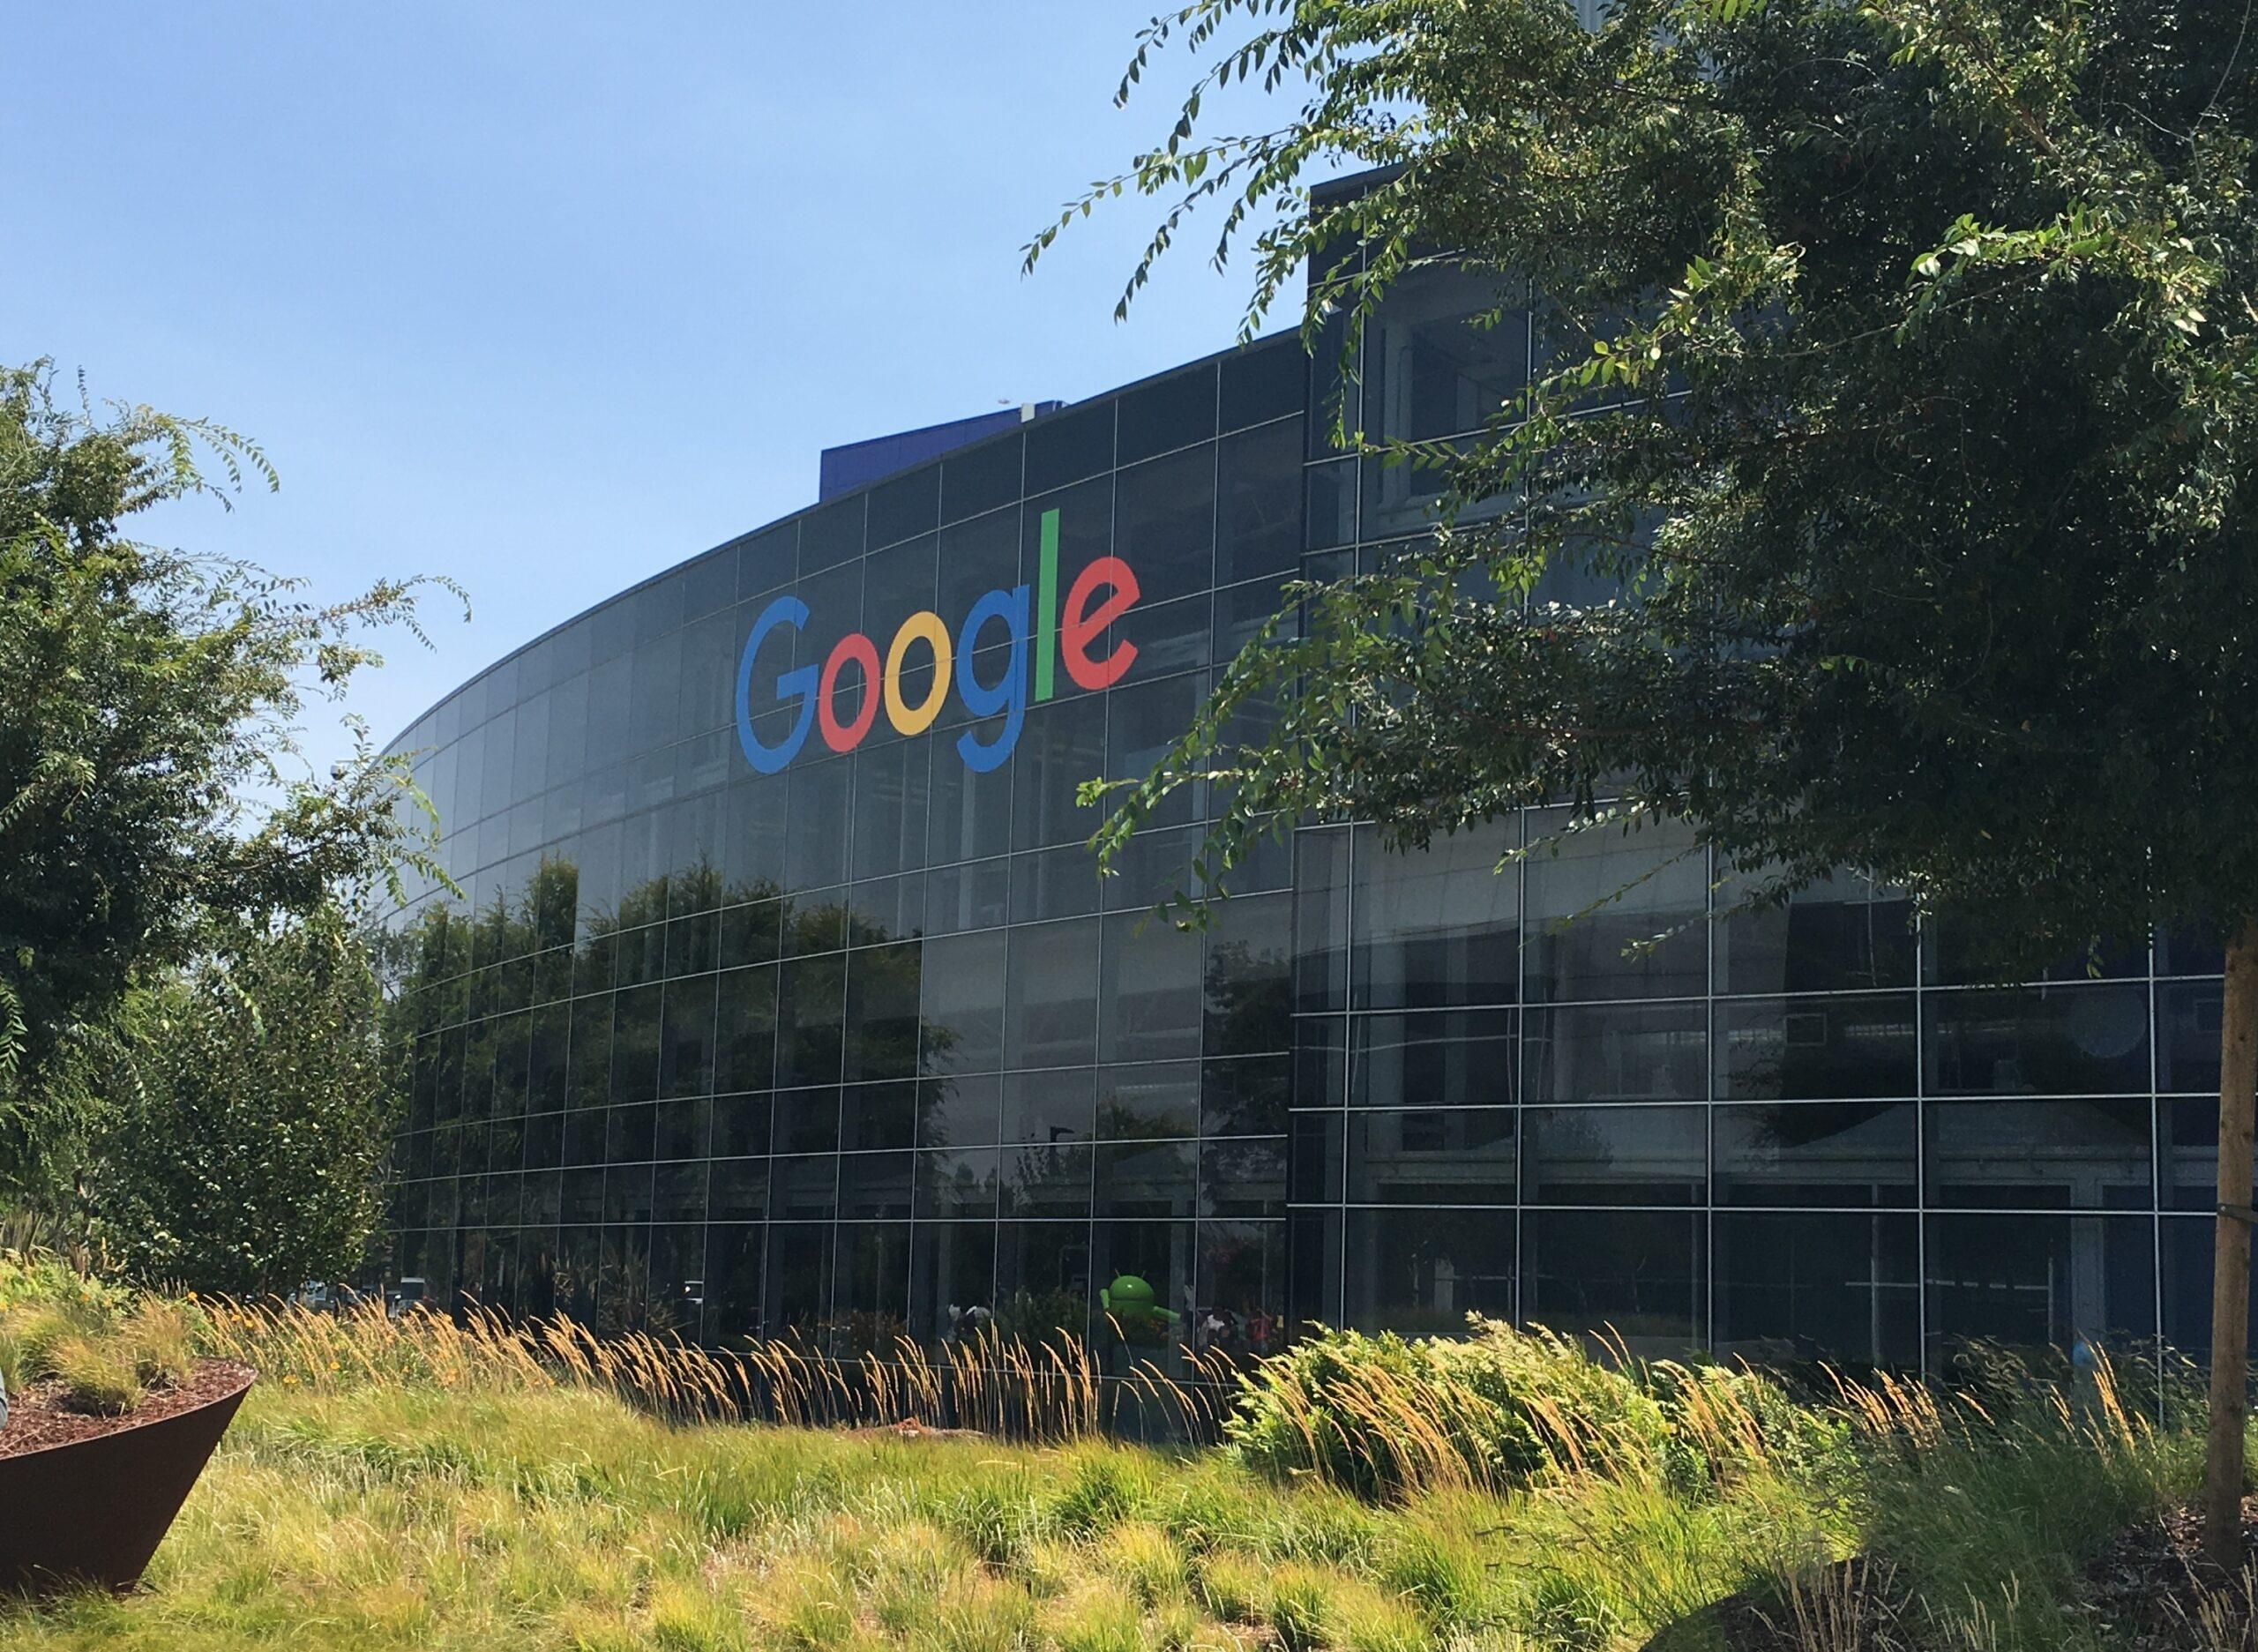 Google's Project Zero shuts down Western counter-terrorist hacker team